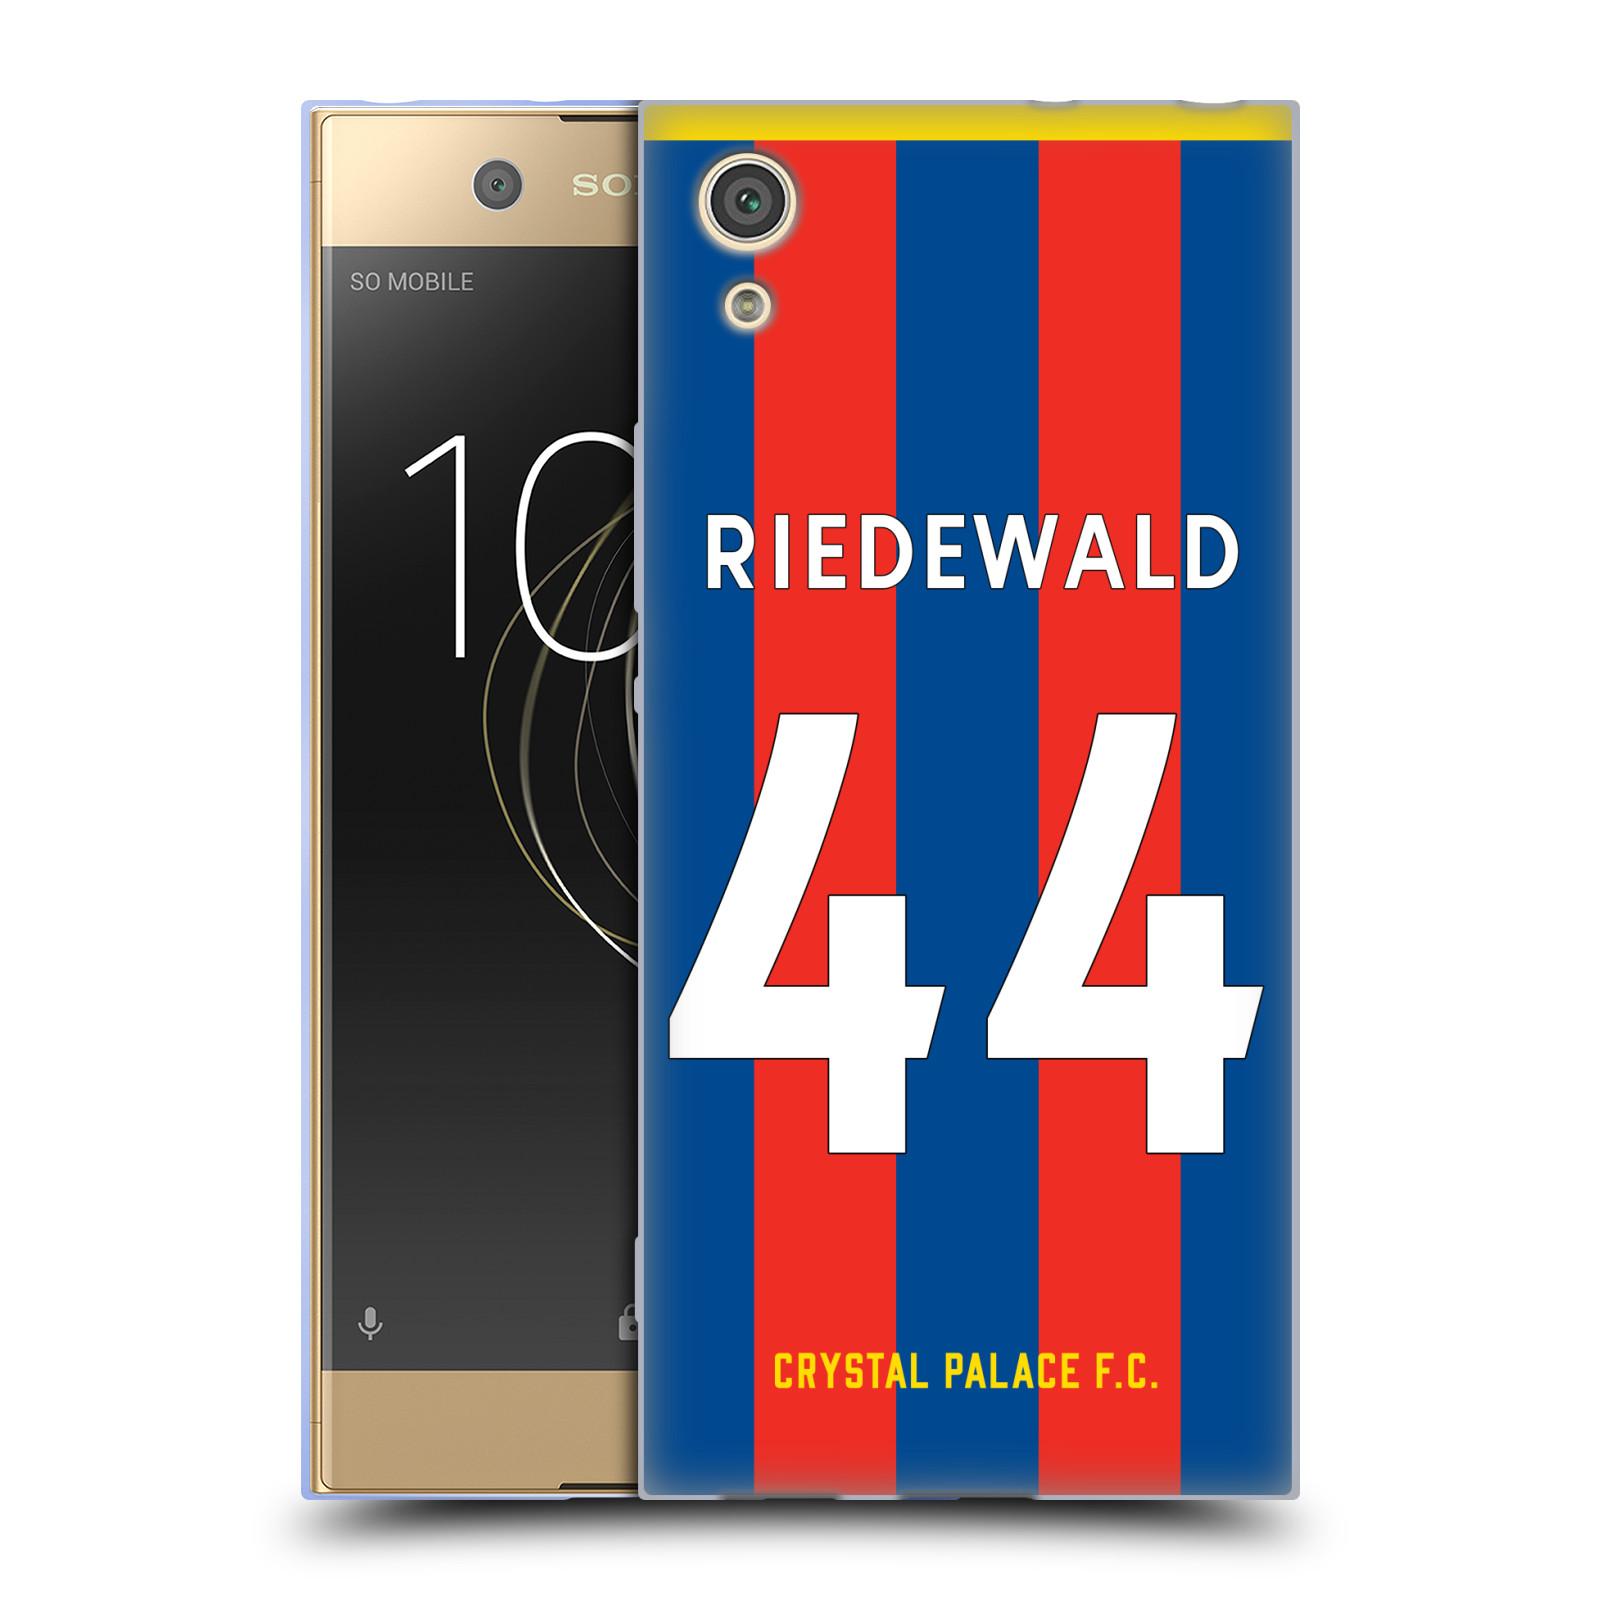 Oficial-Crystal-Palace-FC-2017-18-jugadores-Home-Kit-2-Gel-Estuche-Para-Sony-Telefonos-1